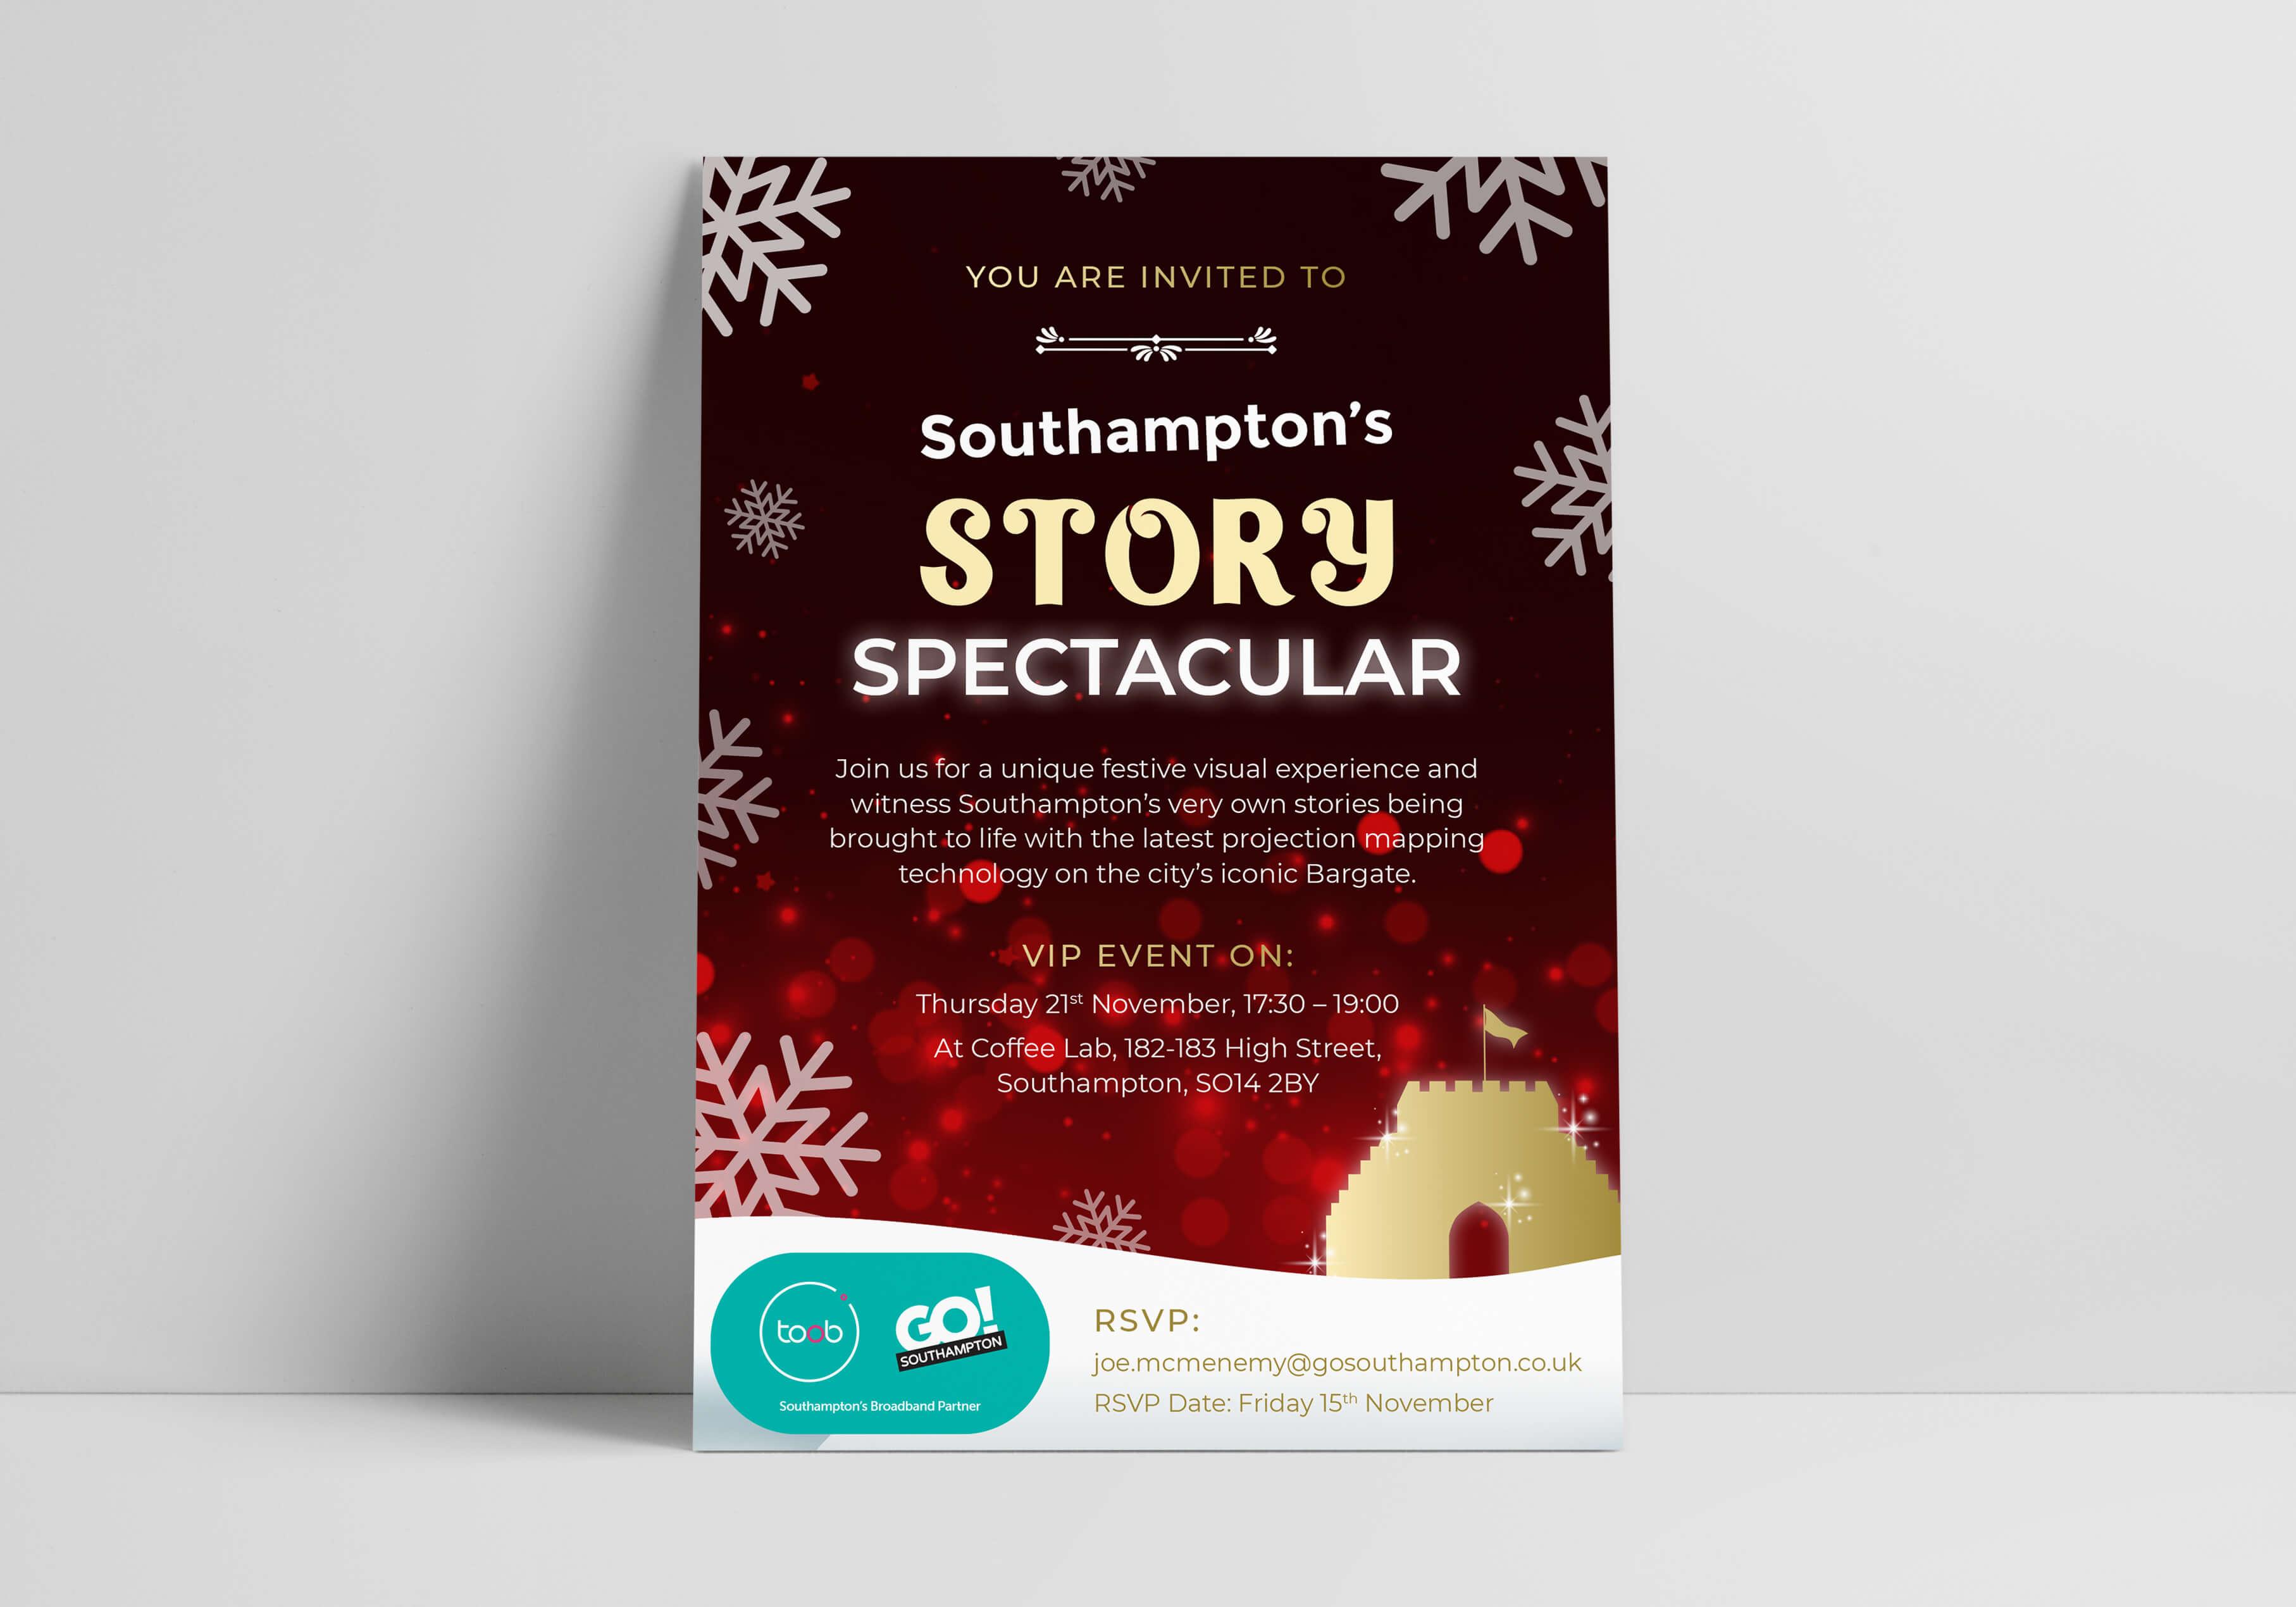 Go! Southampton Christmas Campaign Story Spectacular